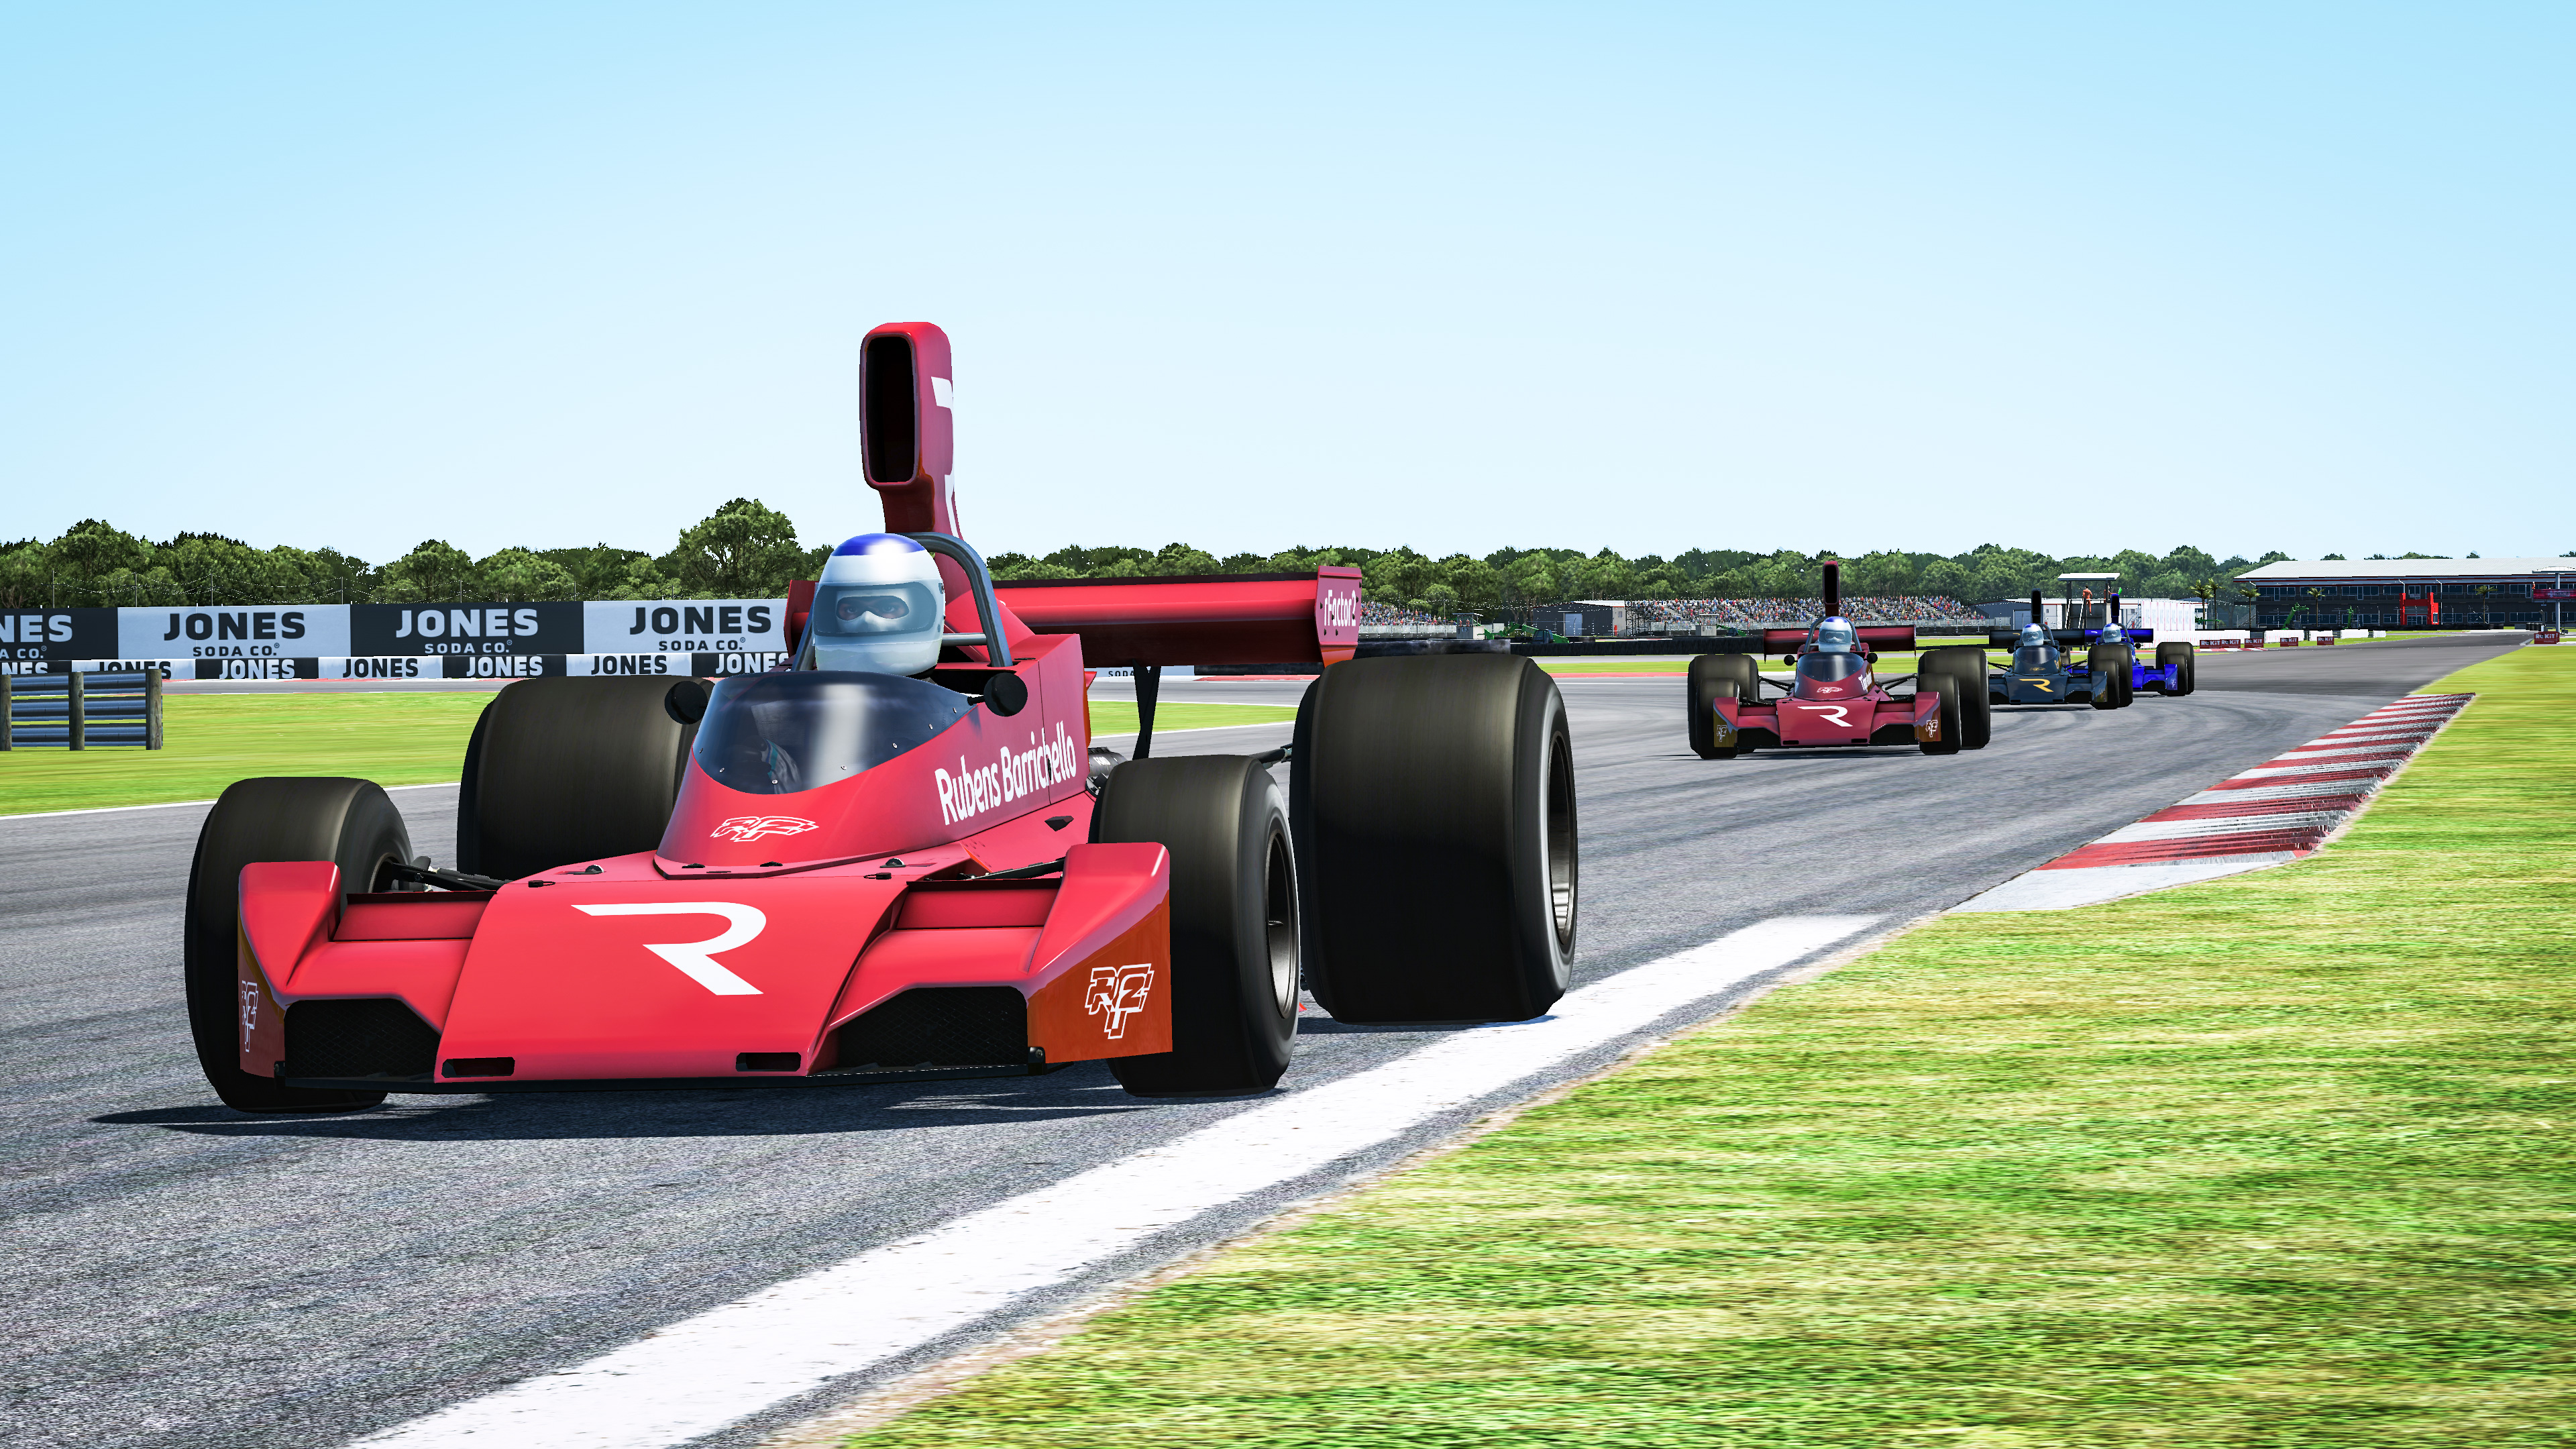 Rubens Barrichello The Race Legends Trophy